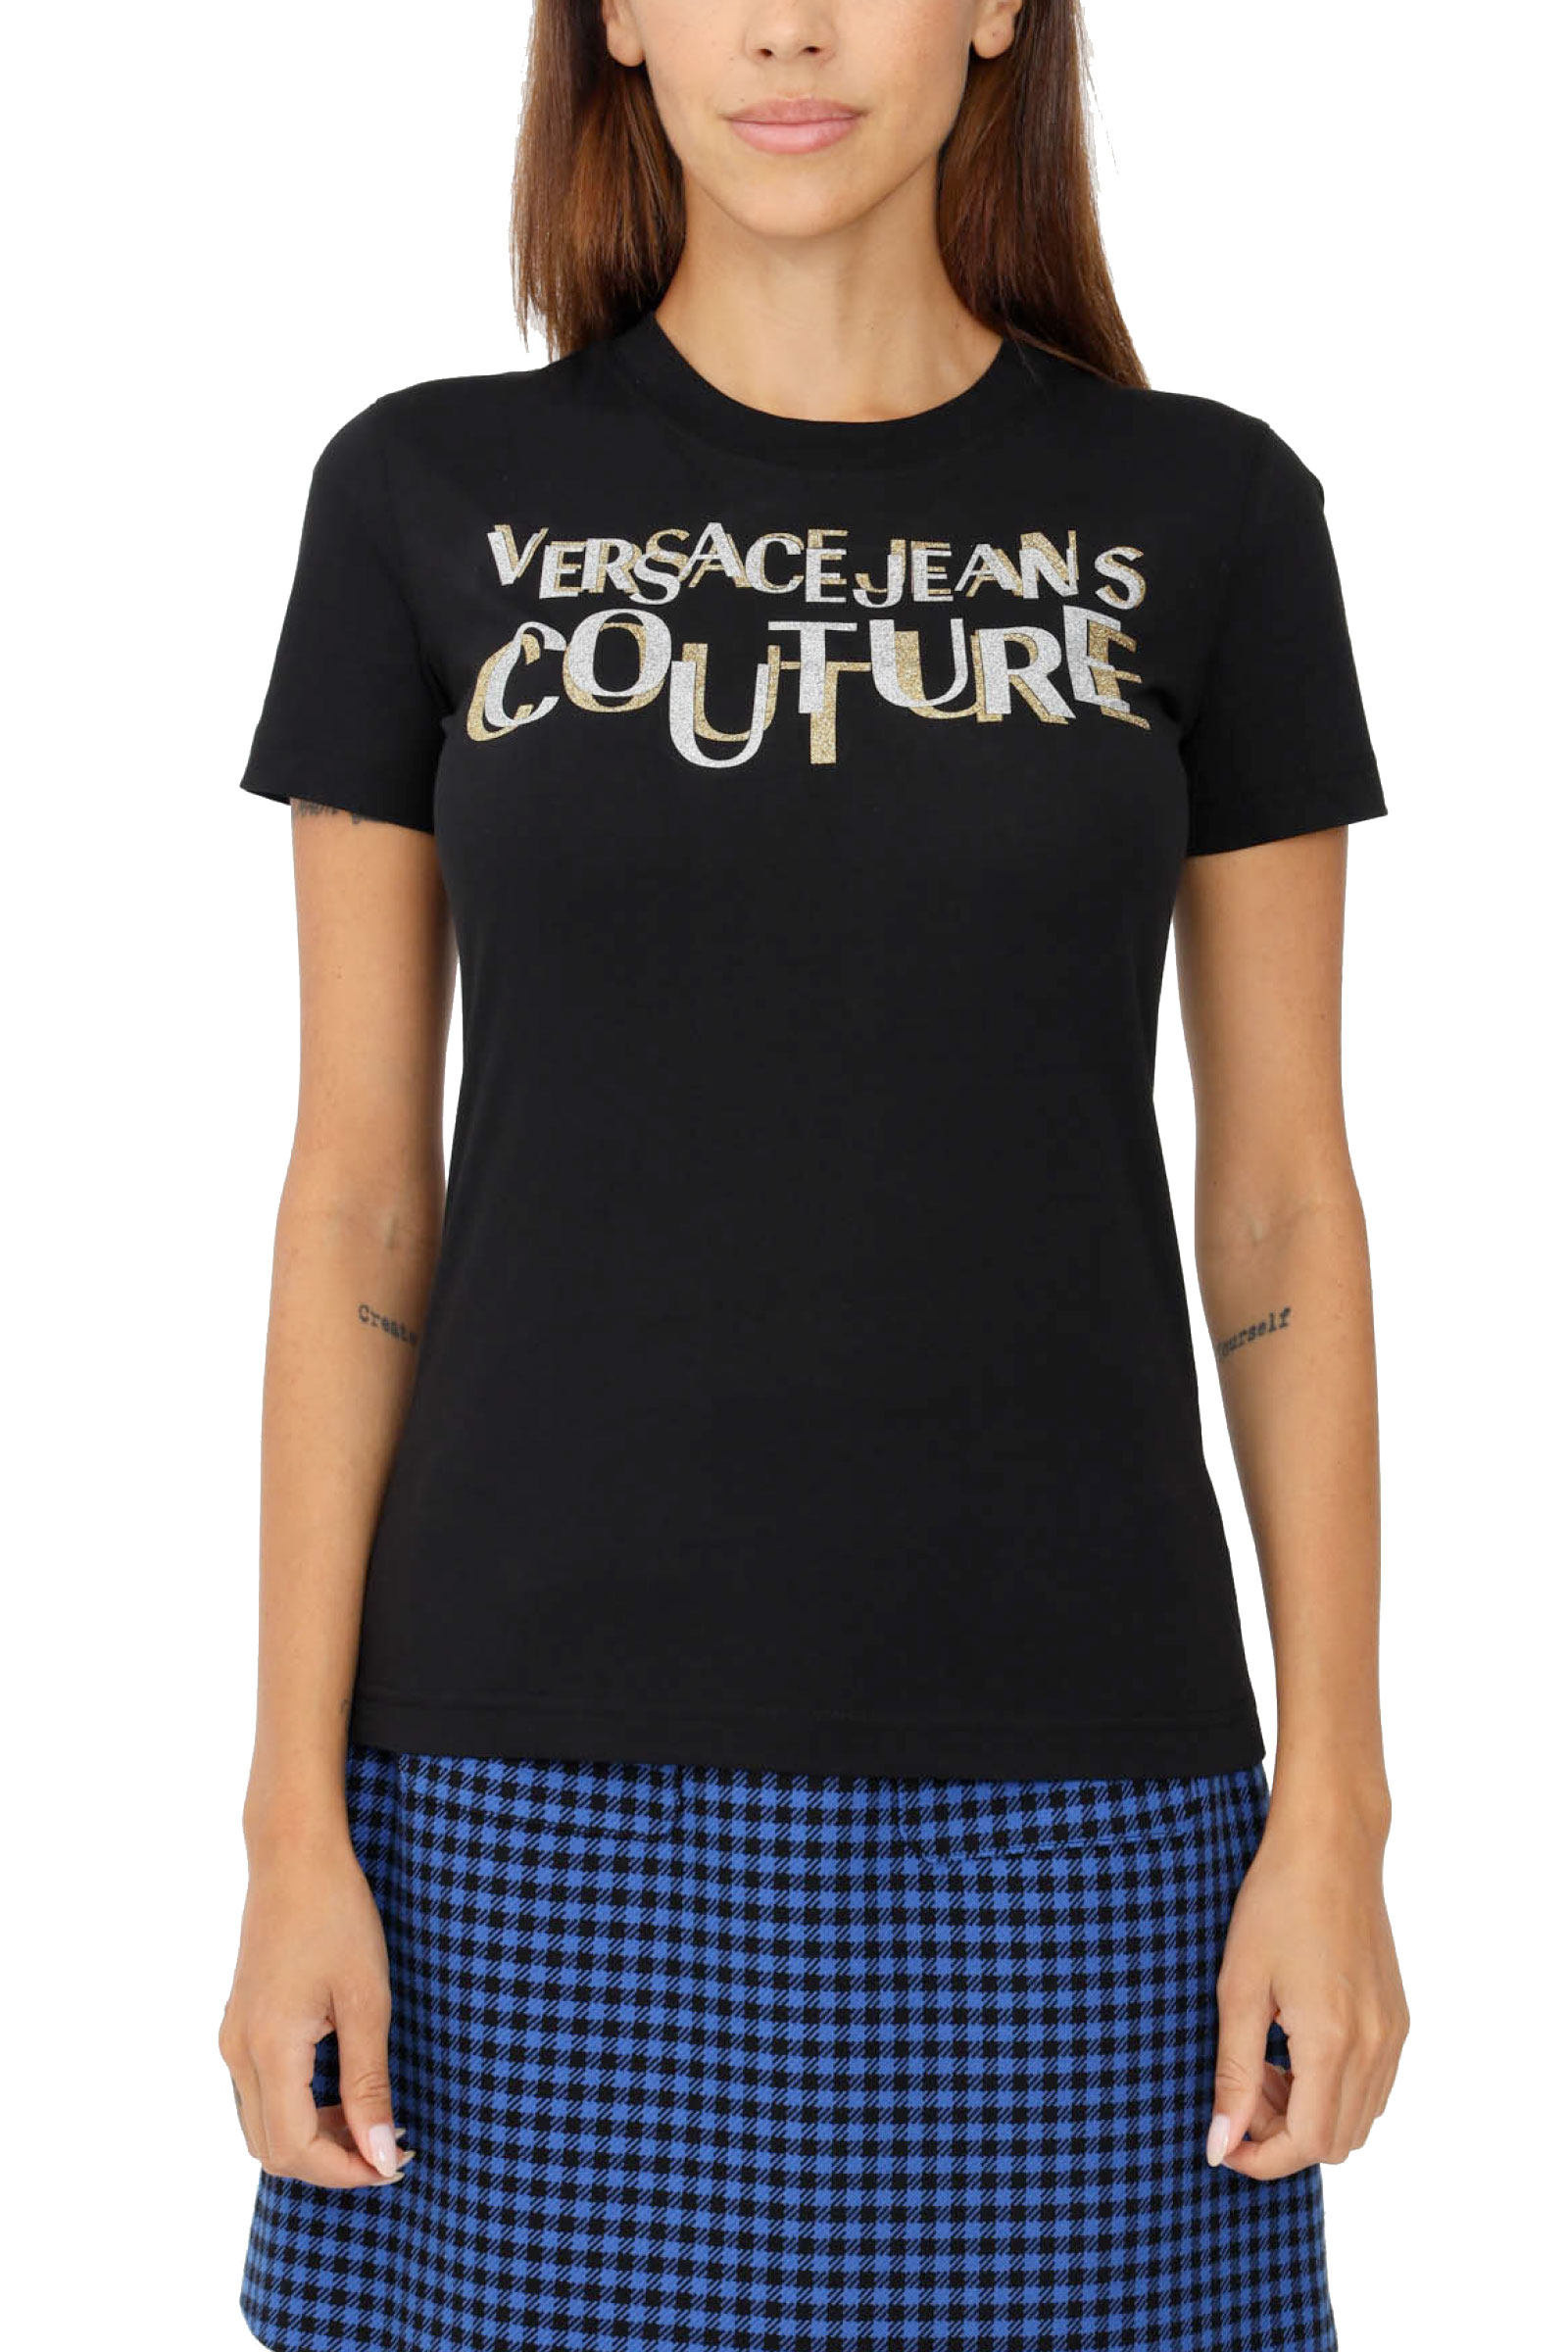 VERSACE JEANS COUTURE | T-Shirt | 71HAHT02 CJ00TG89